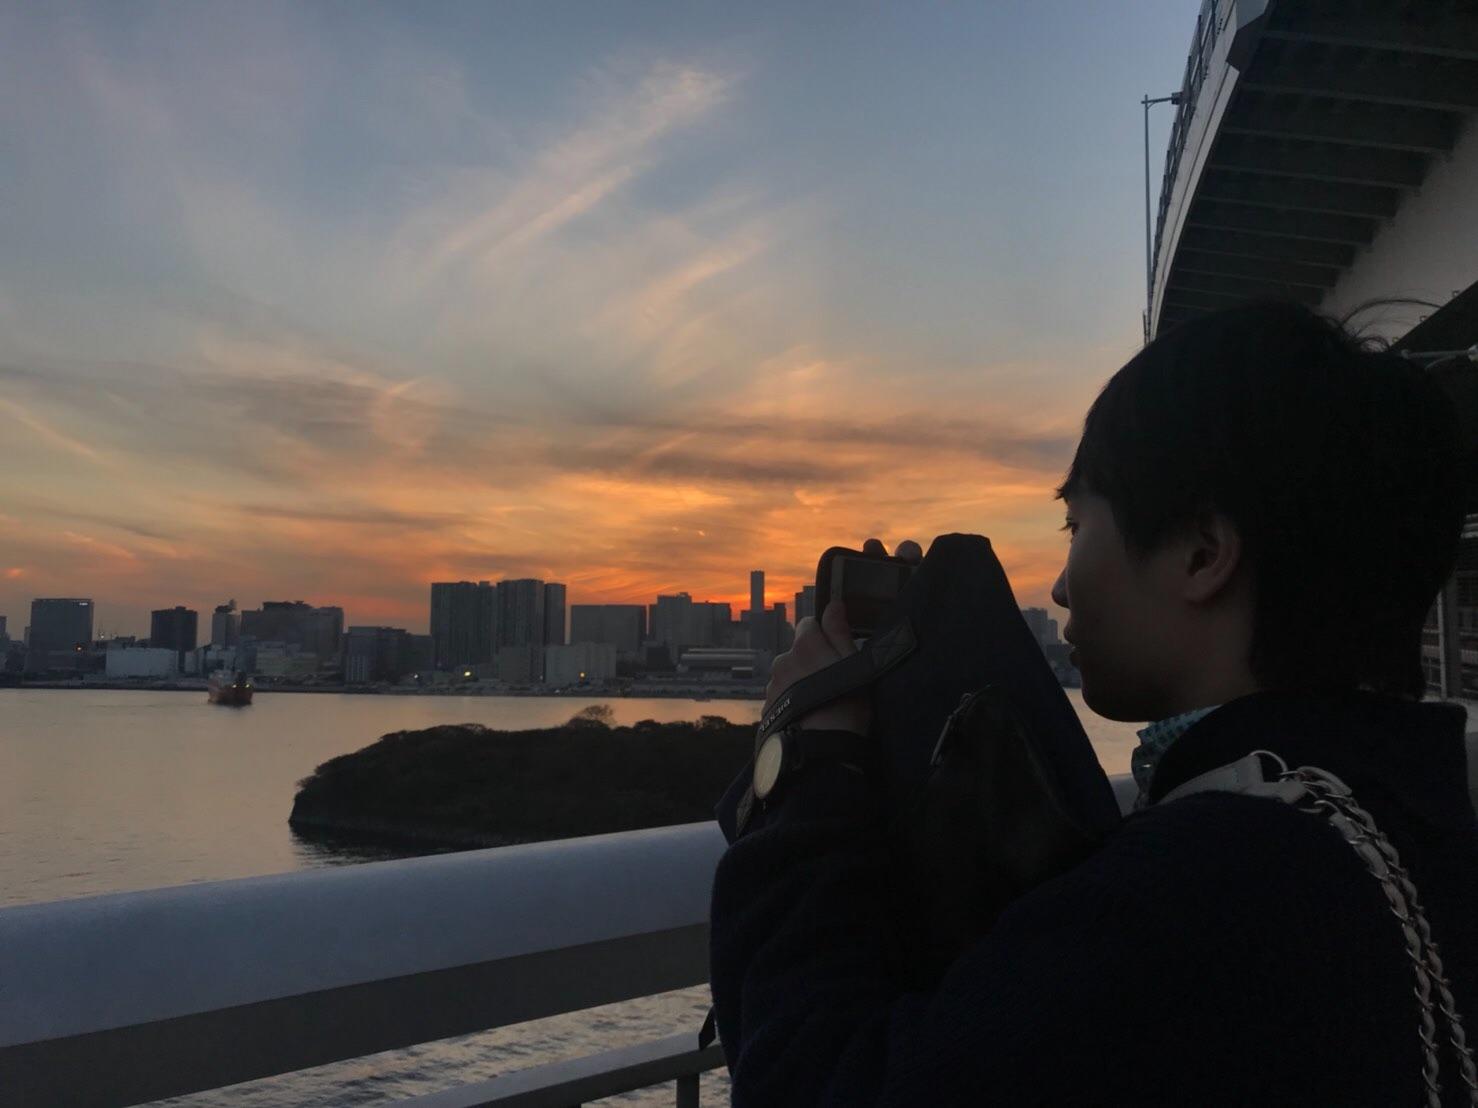 f:id:Hsiao-Jen:20181023225627j:image